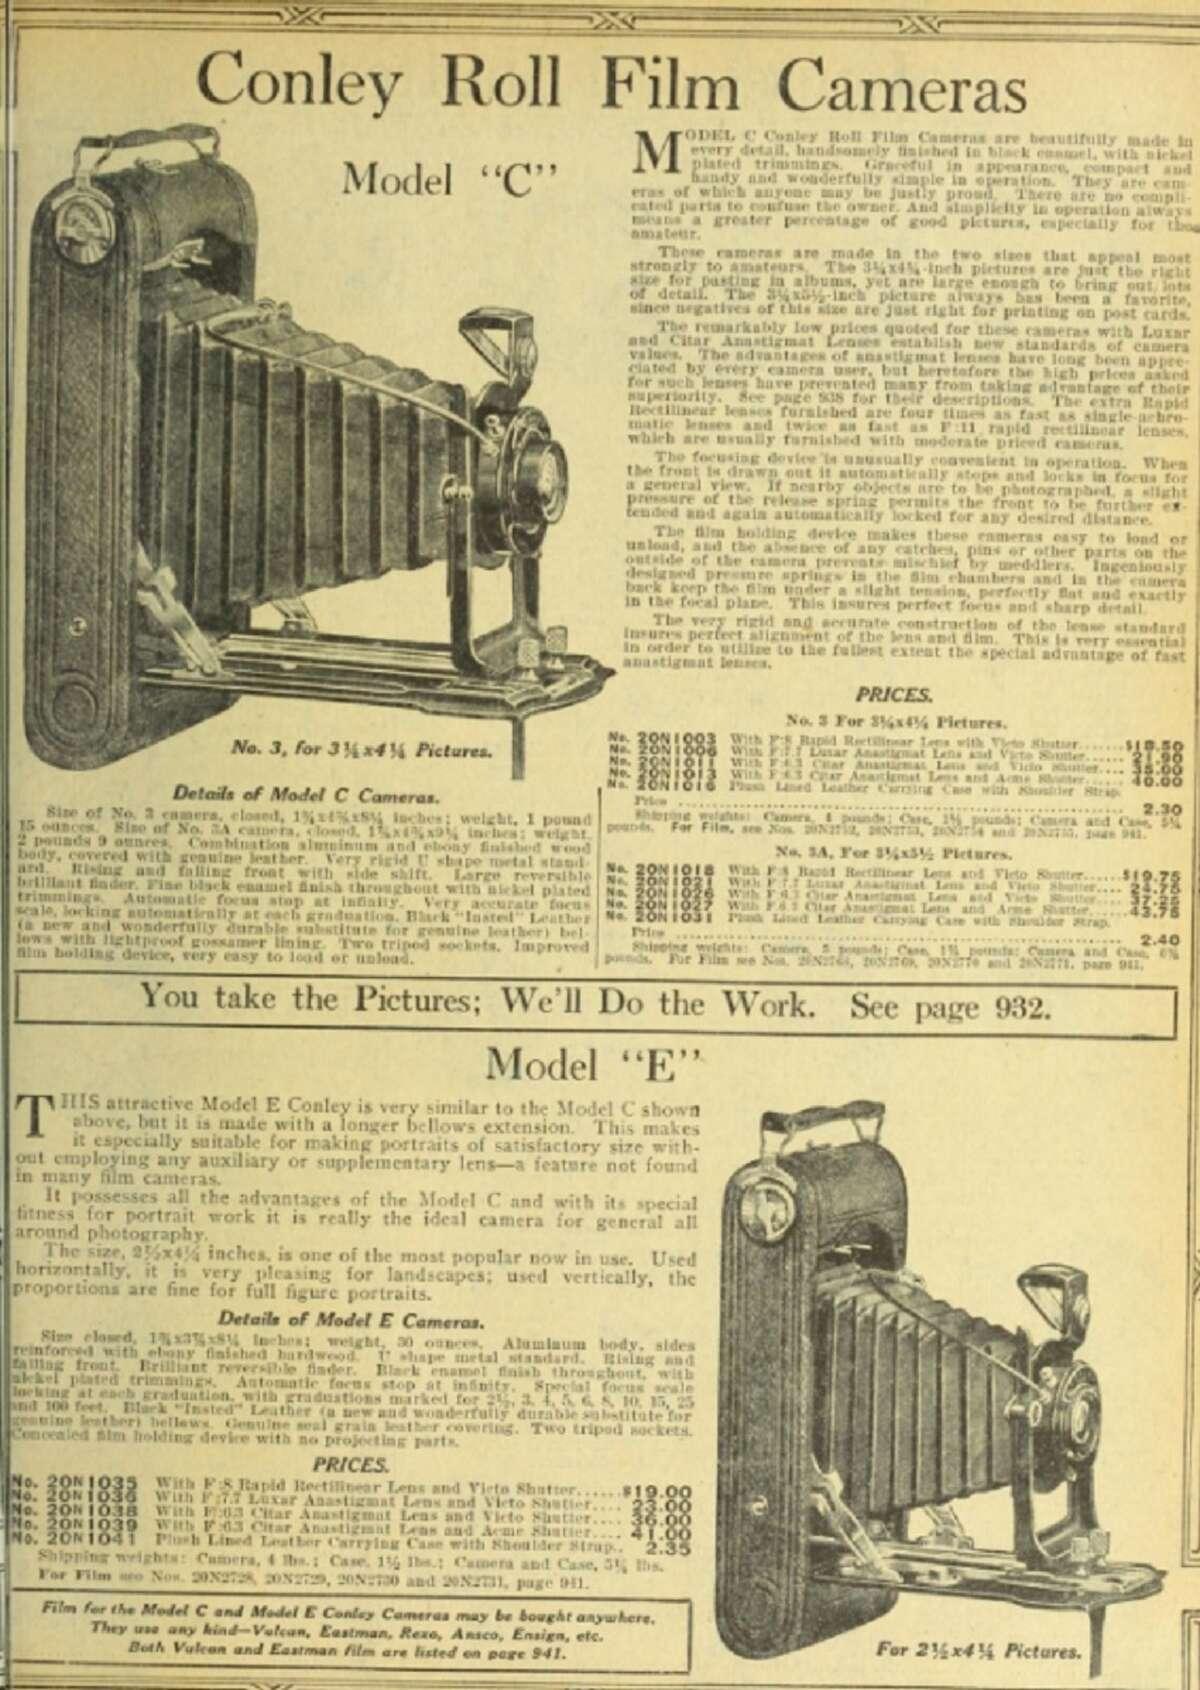 1918 Sears, Roebuck and Co. similar item, Model E Conley camera -$43.75: In 2018,$770.39